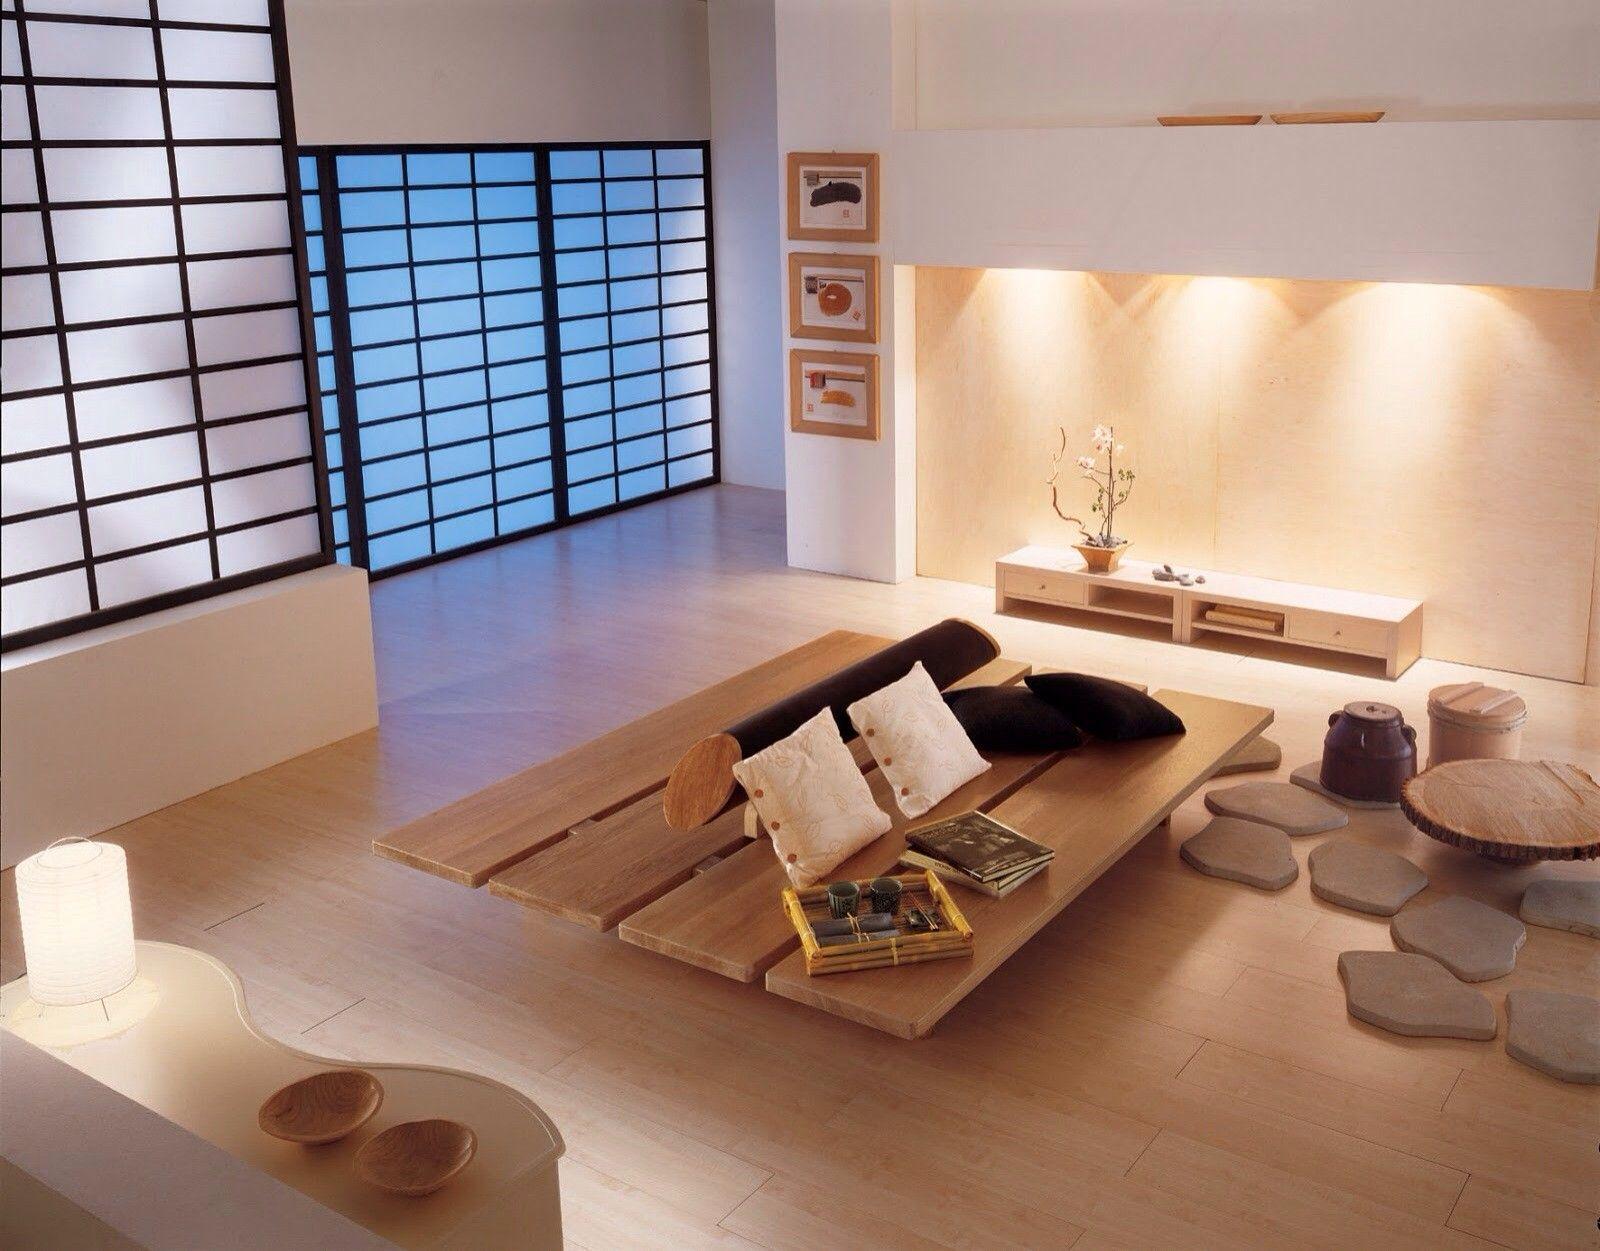 Pin by jeanne on feng shui & zen pinterest interior interior